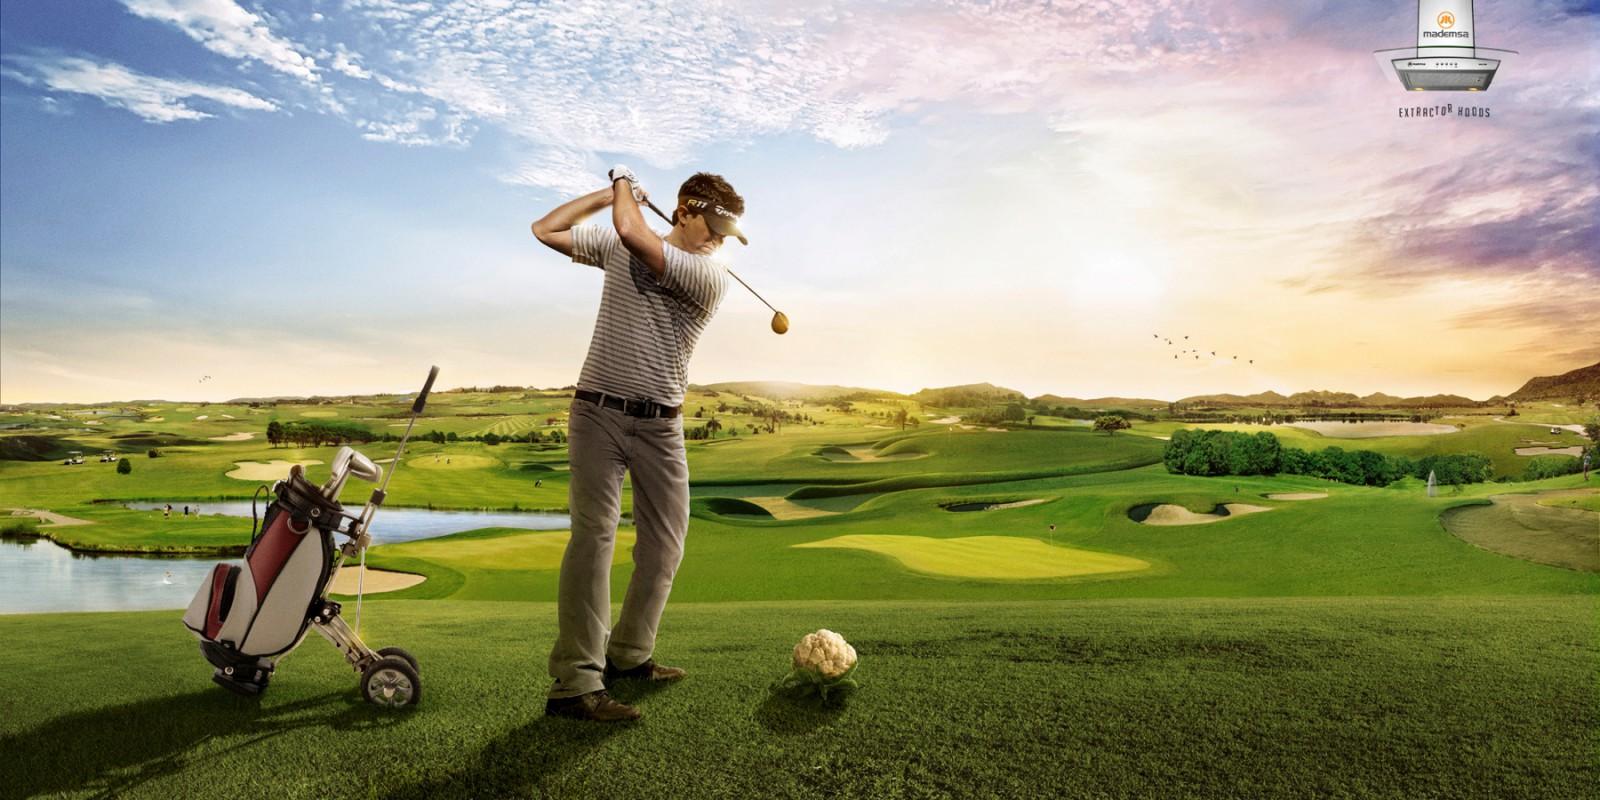 nguoi-choi-golf